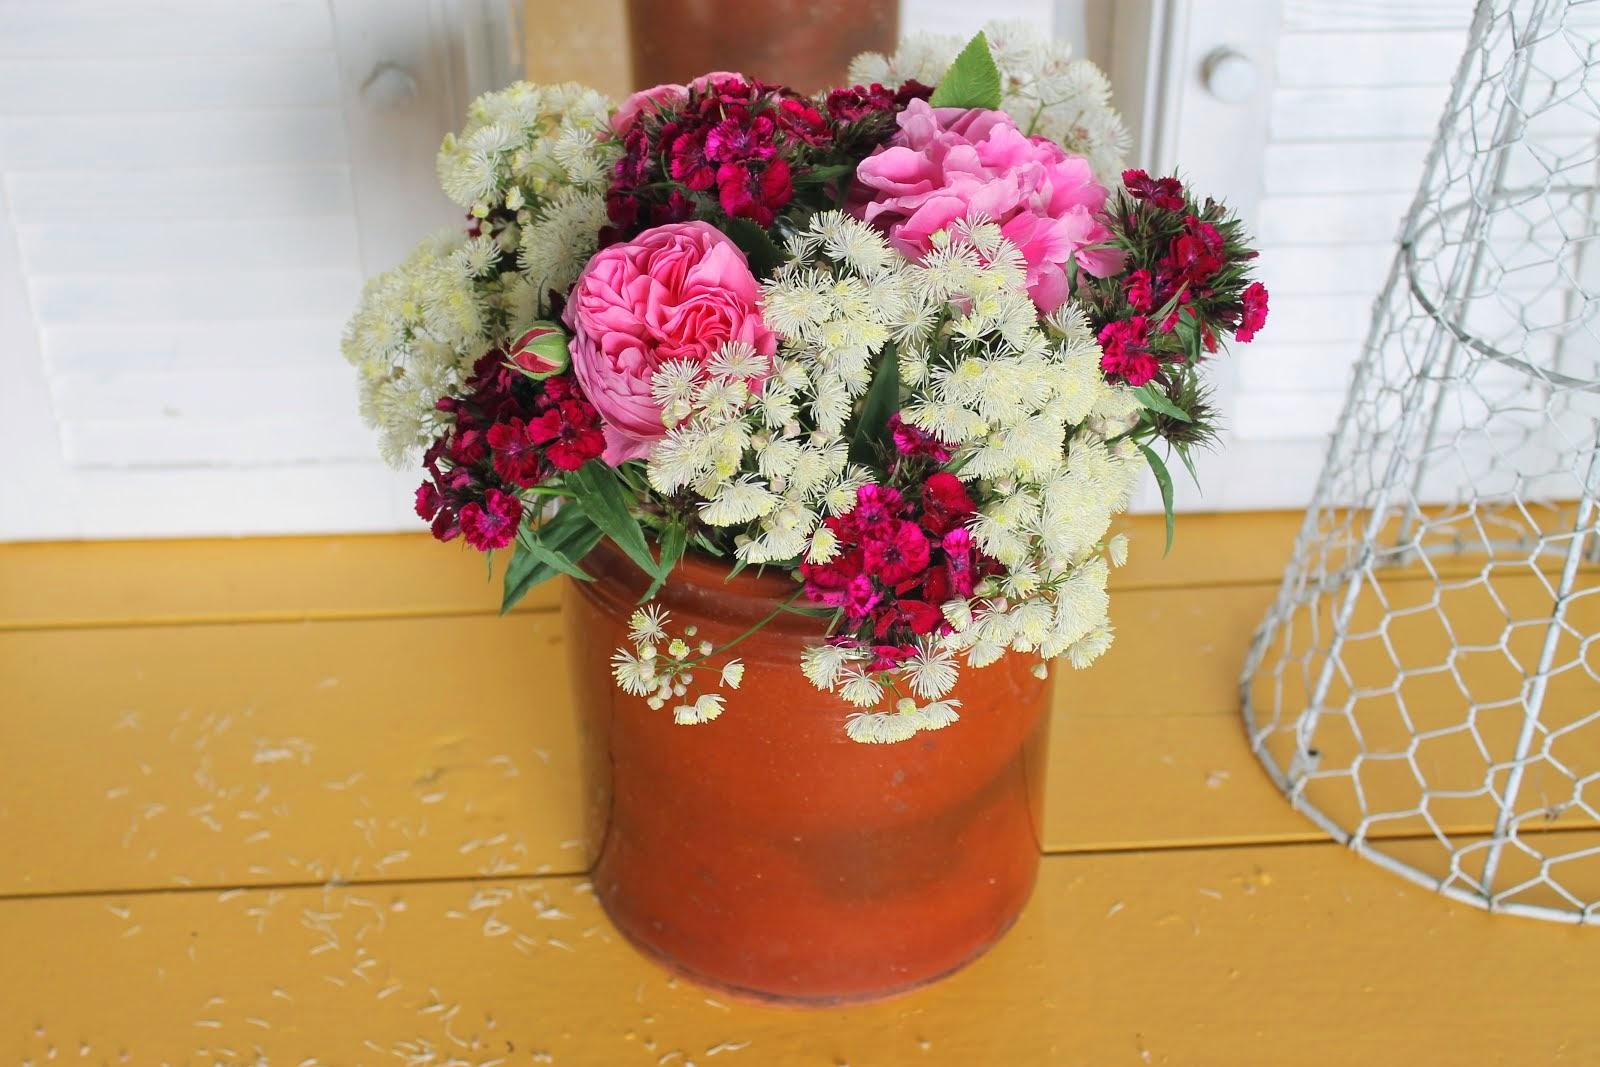 Roser,frøstjerne og busknellik